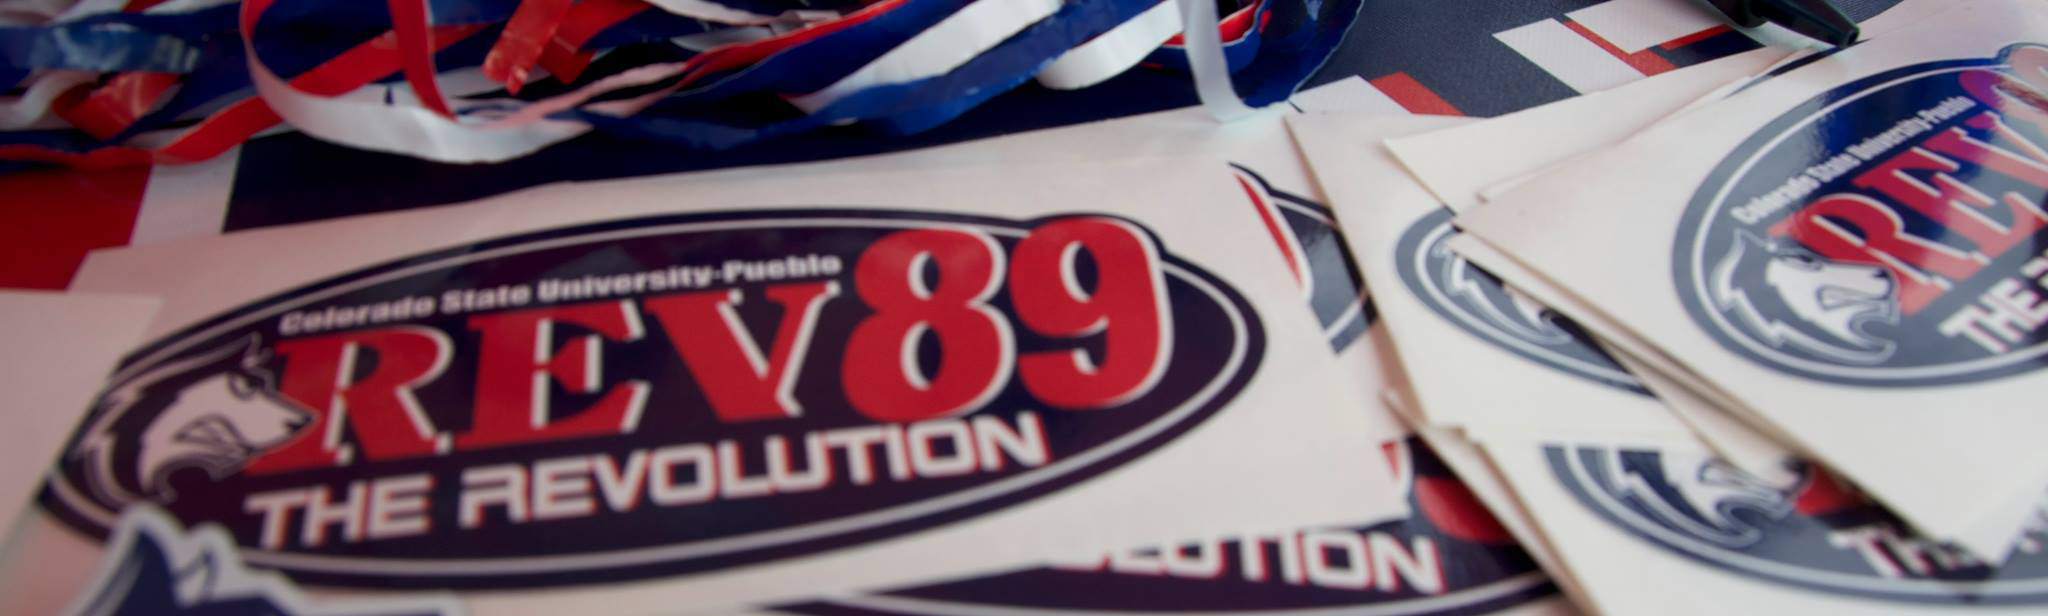 REV 89 FM